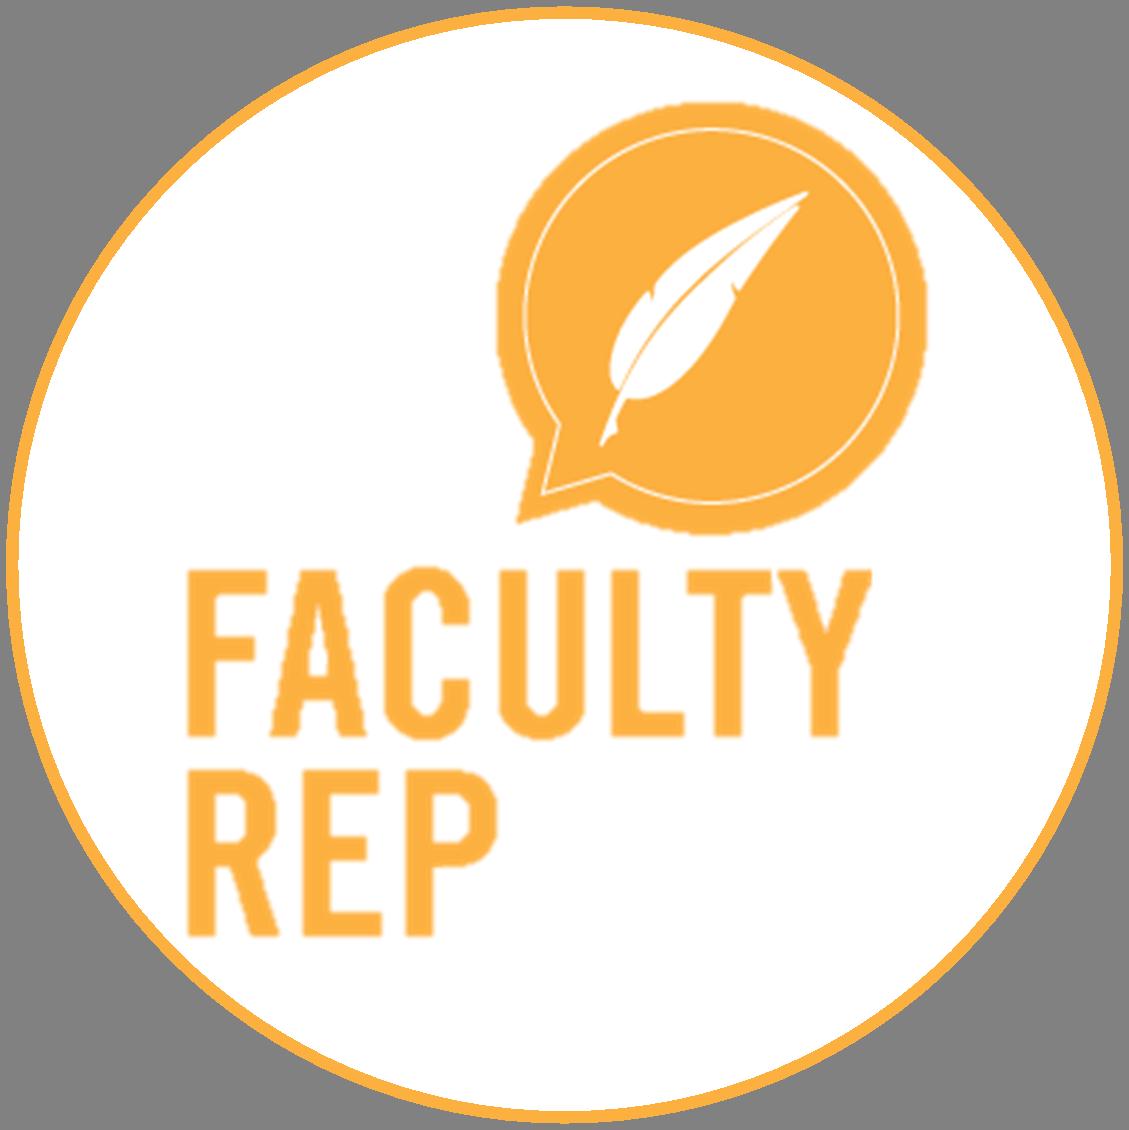 Faculty Reps